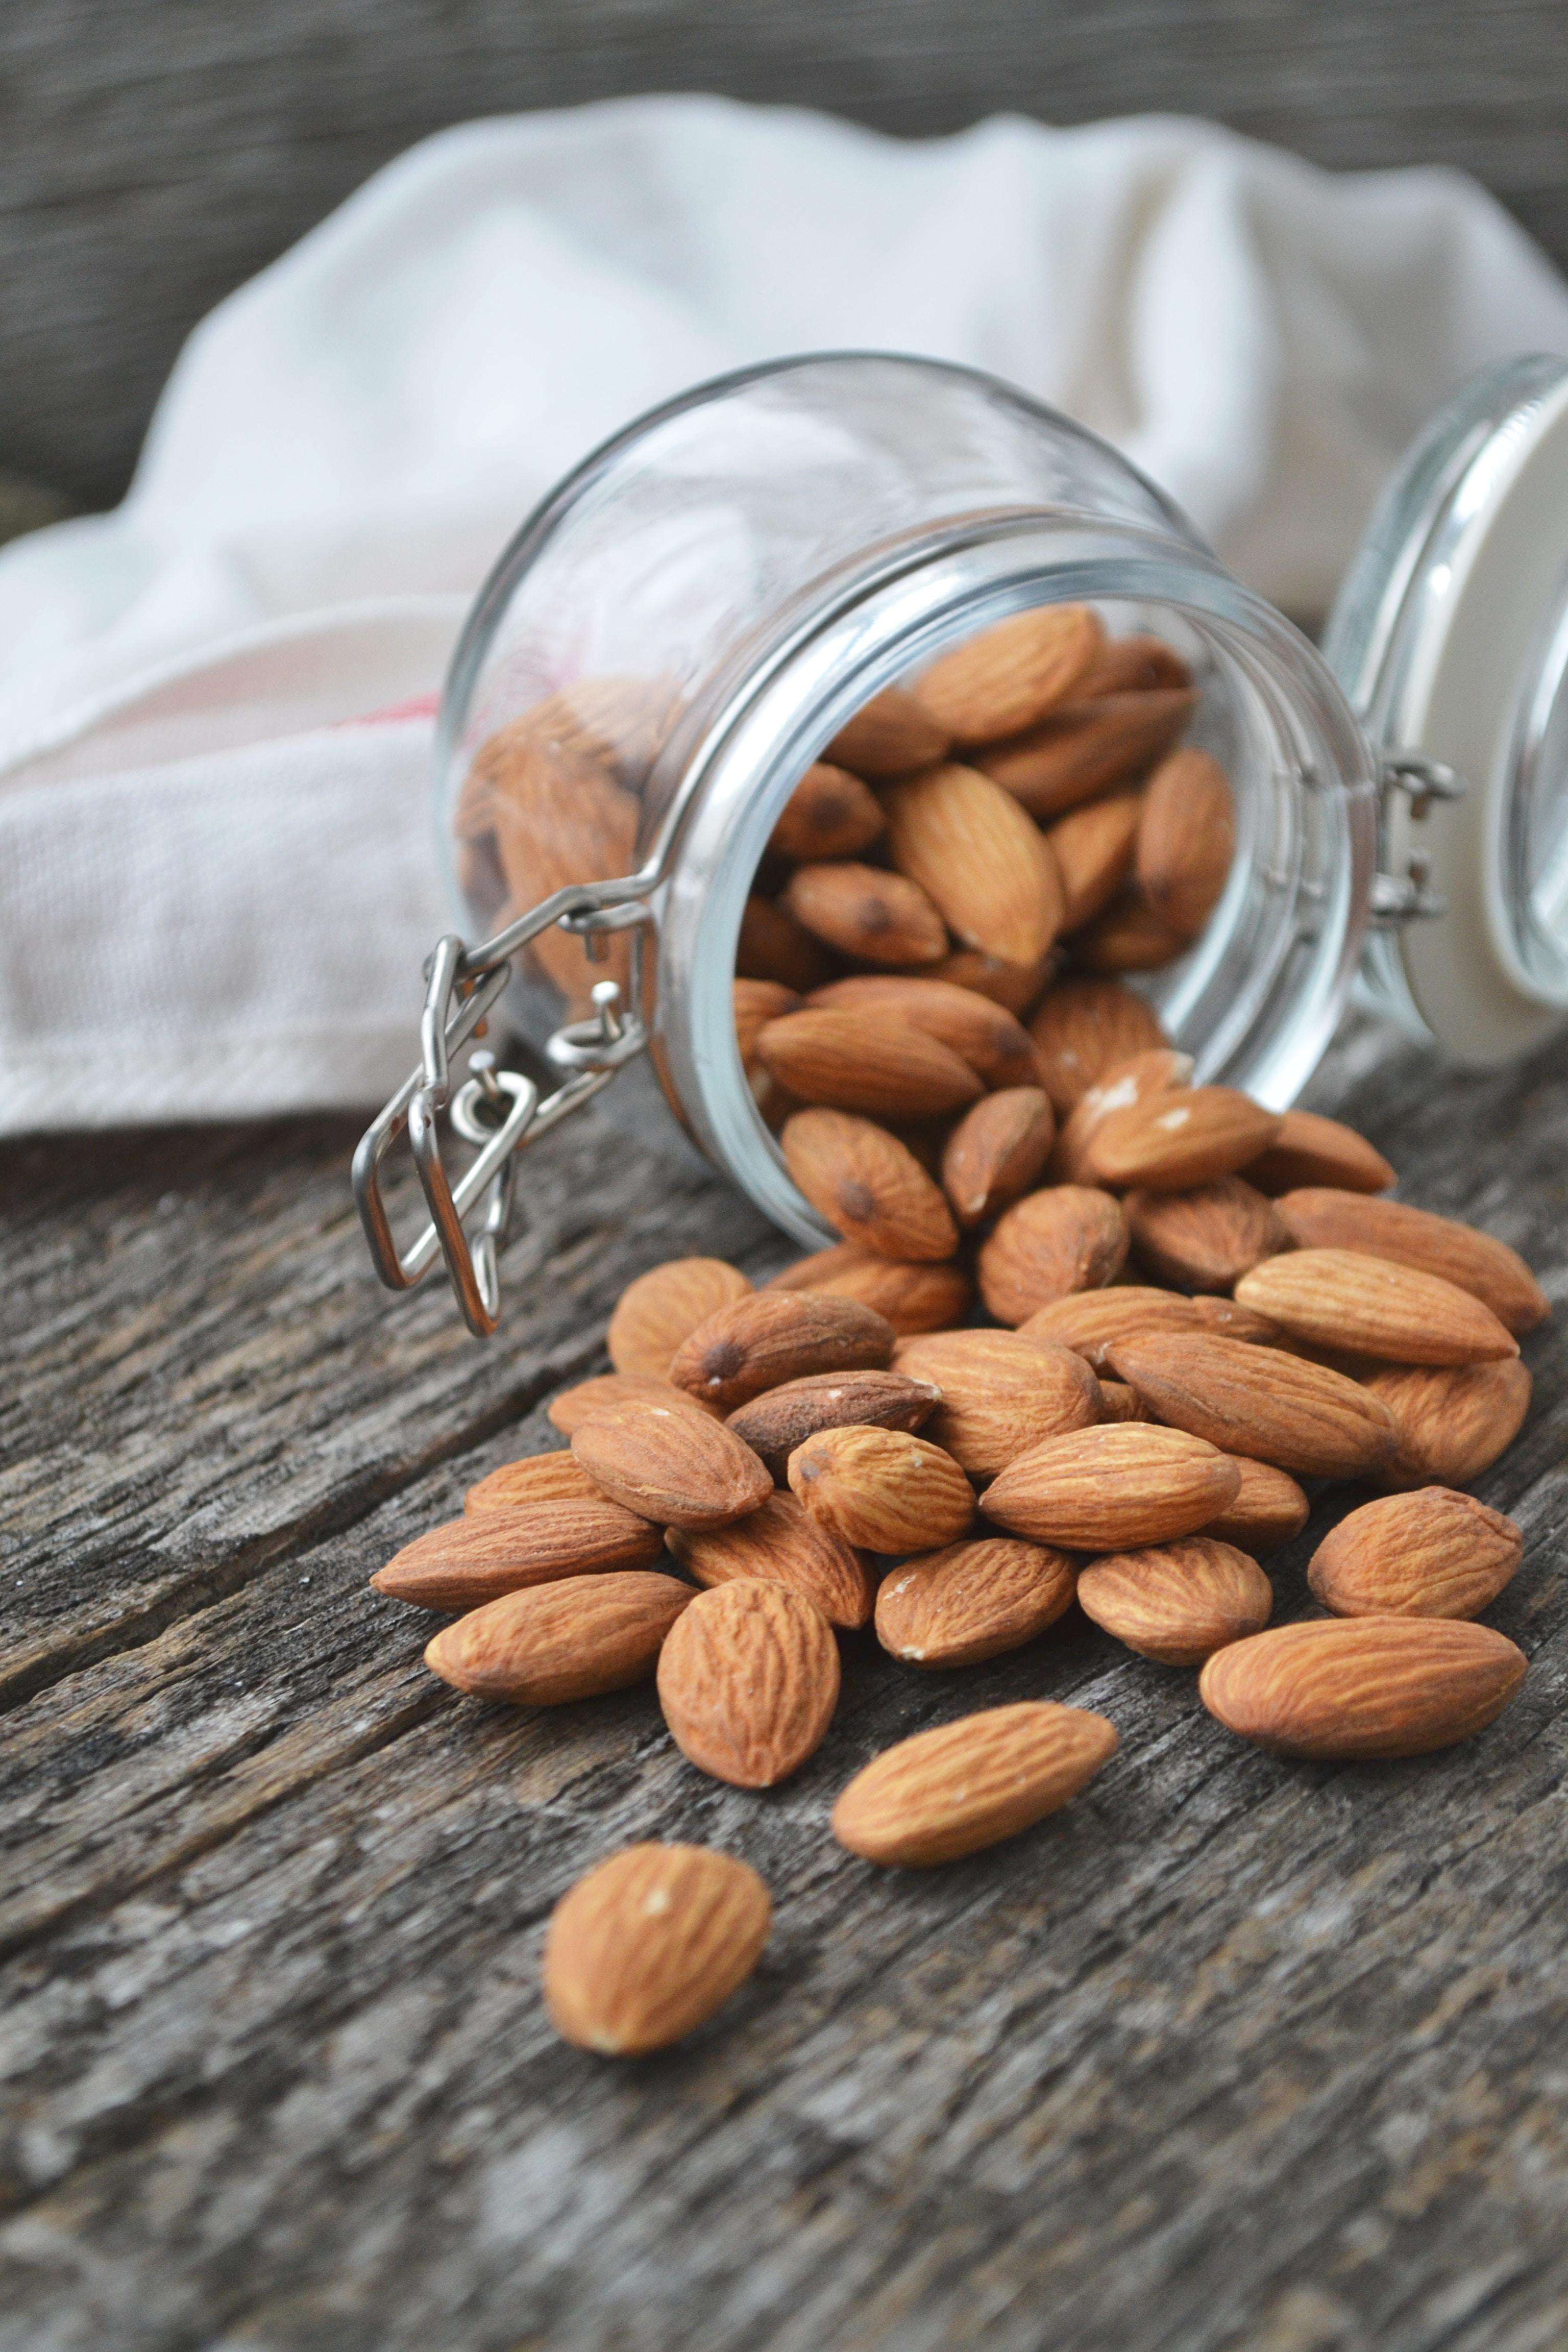 close up photo of Almonds